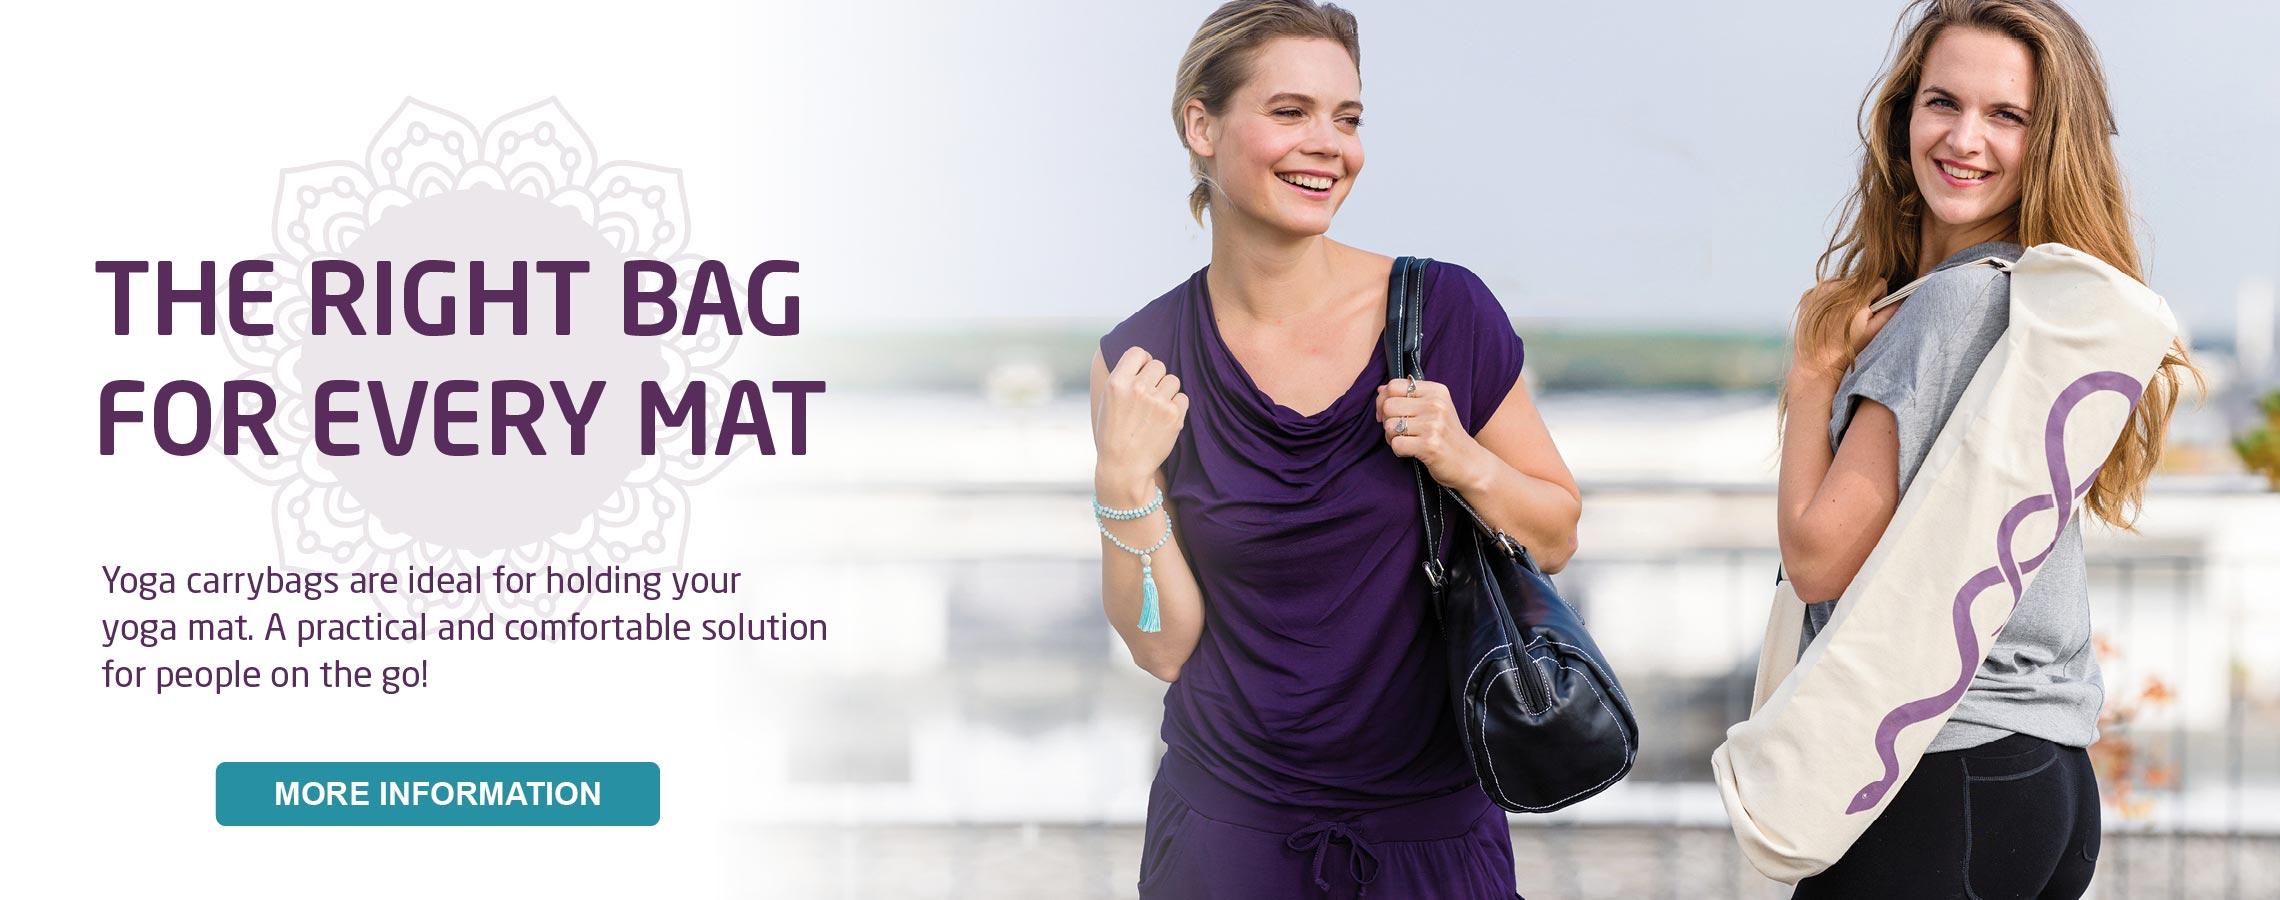 Startpage Teaser Bags